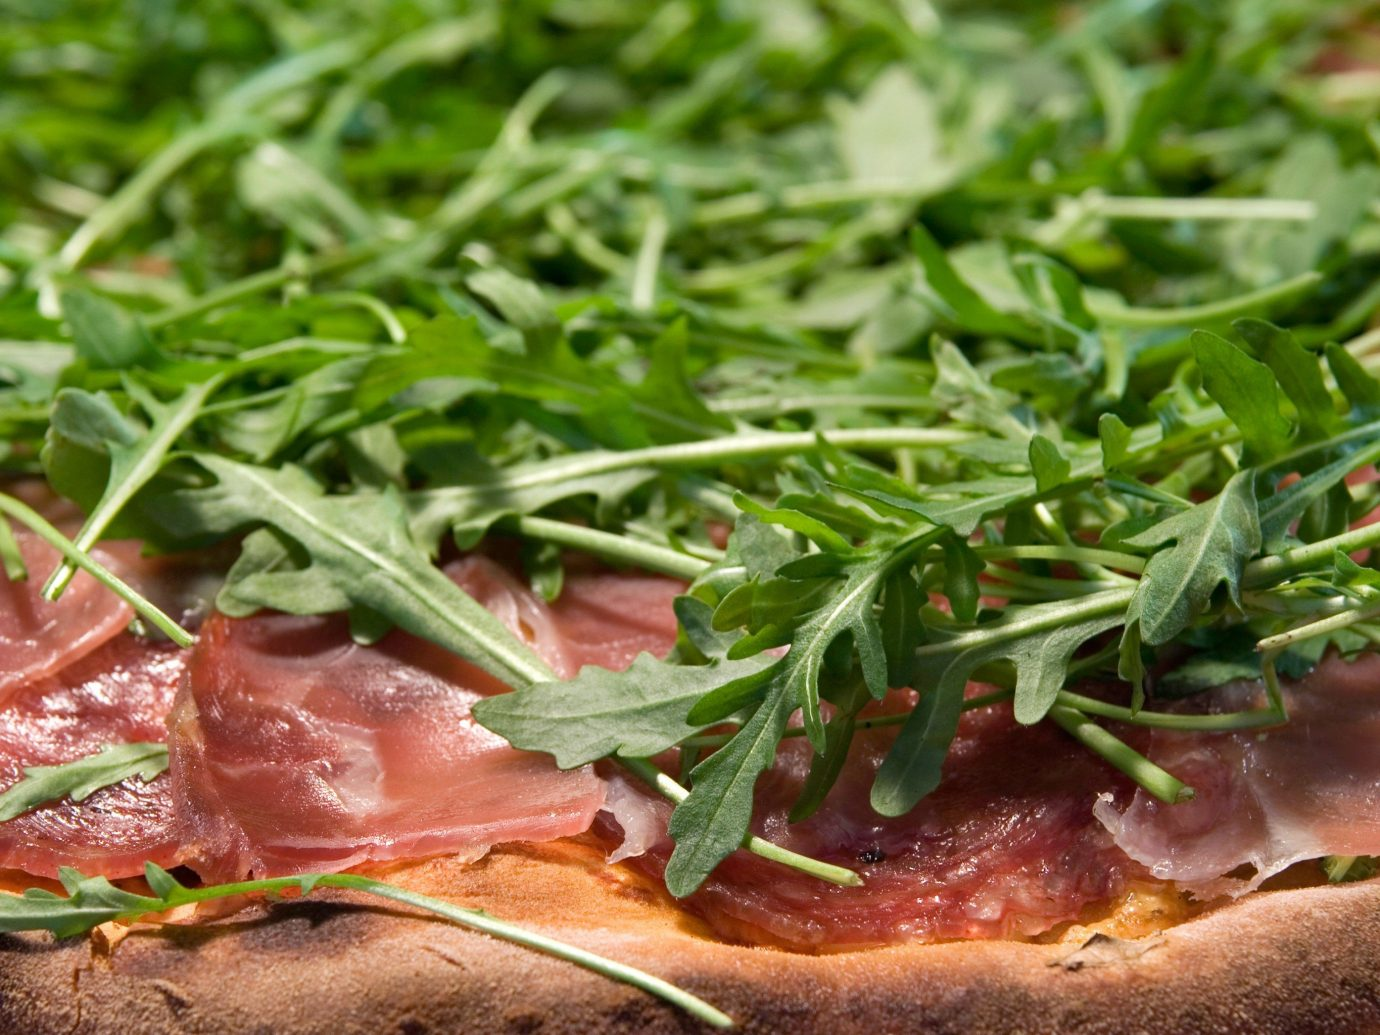 Beach food dish meat cuisine produce green salt cured meat prosciutto vegetable sauce fresh